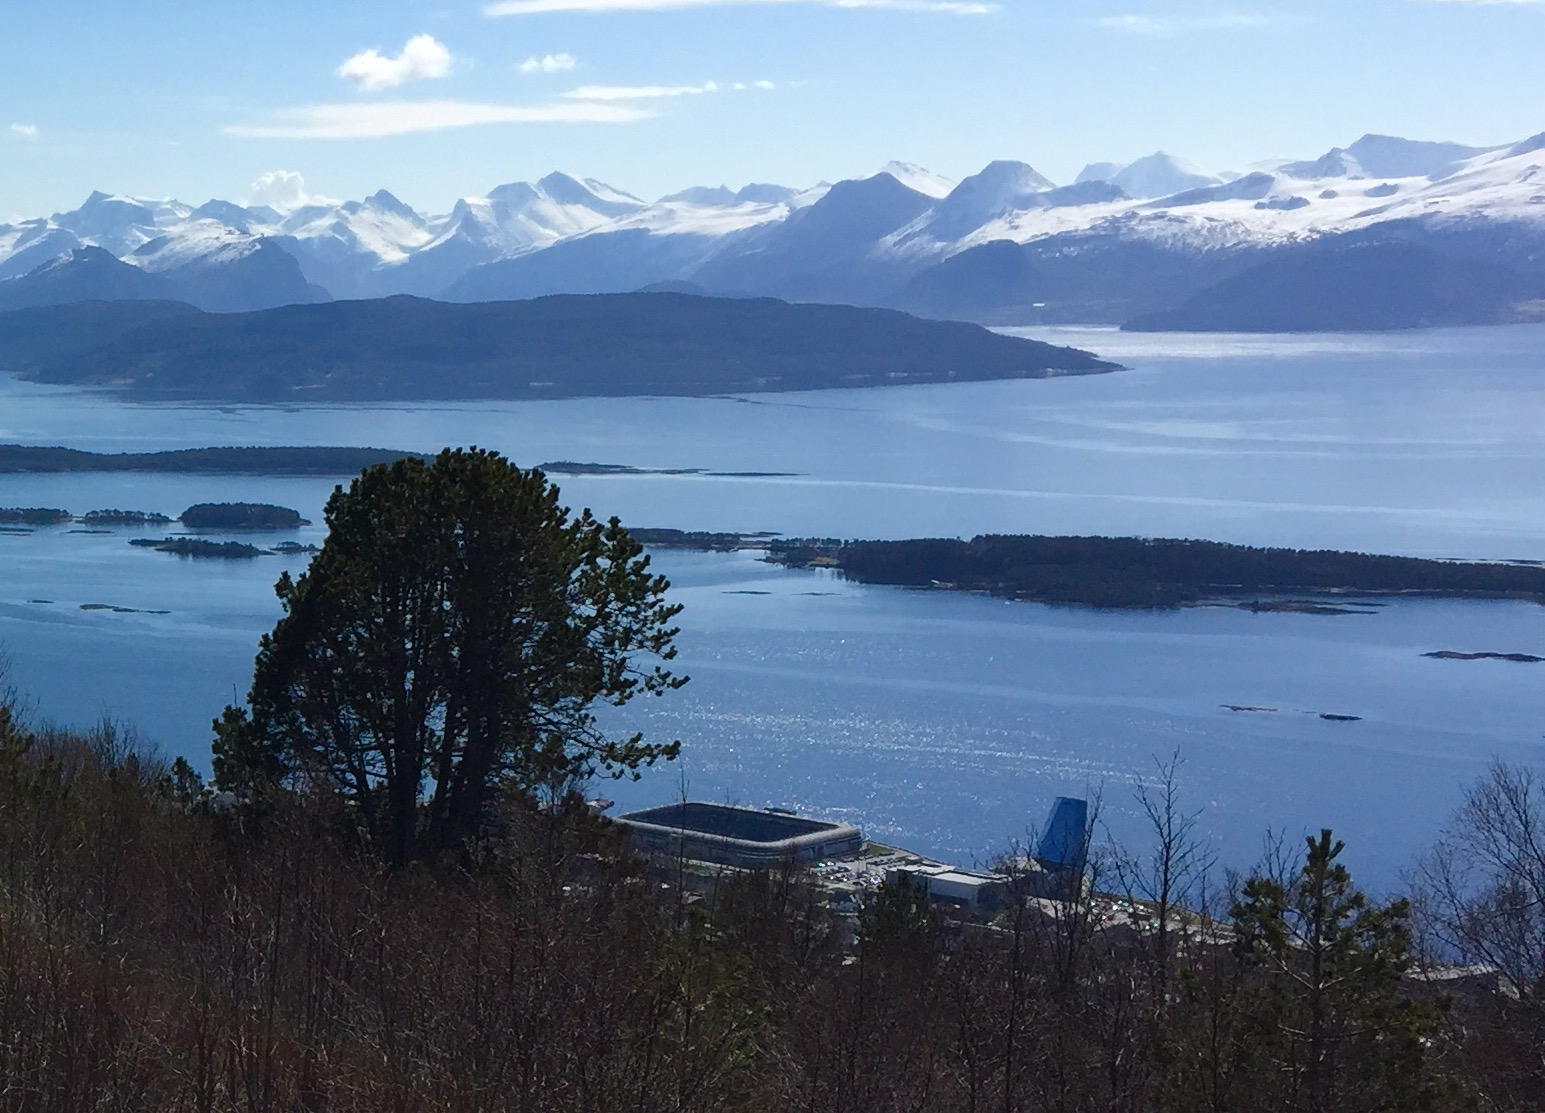 Aker stadion ligger veldig fint til ved fjorden. Doto: Odd Roar Lange